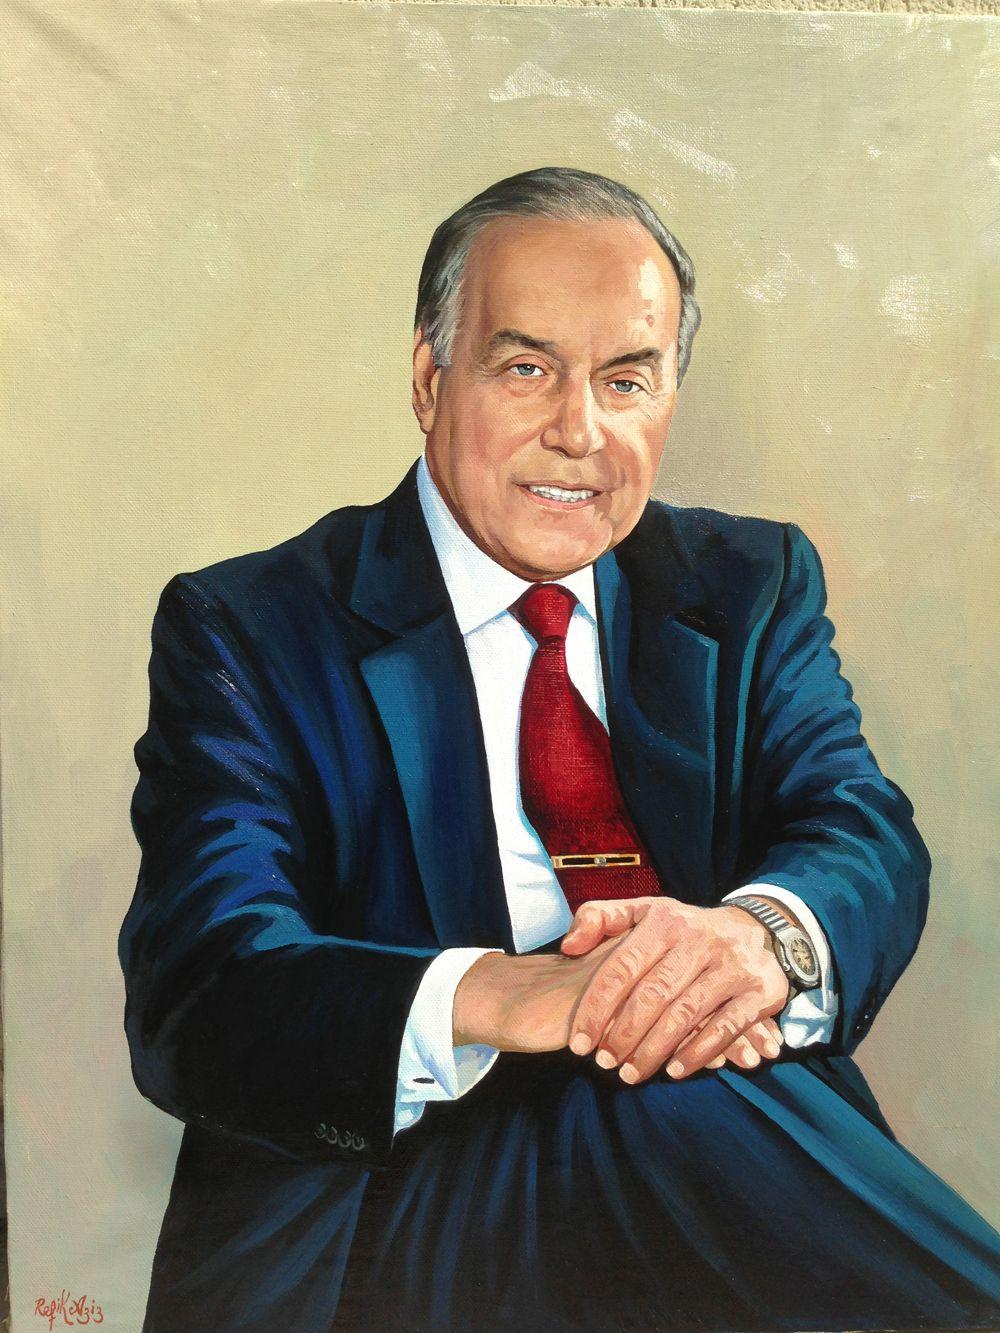 Bu Artist Painter Rafiq əziz From Azerbayjan Artist Painter Suit Jacket